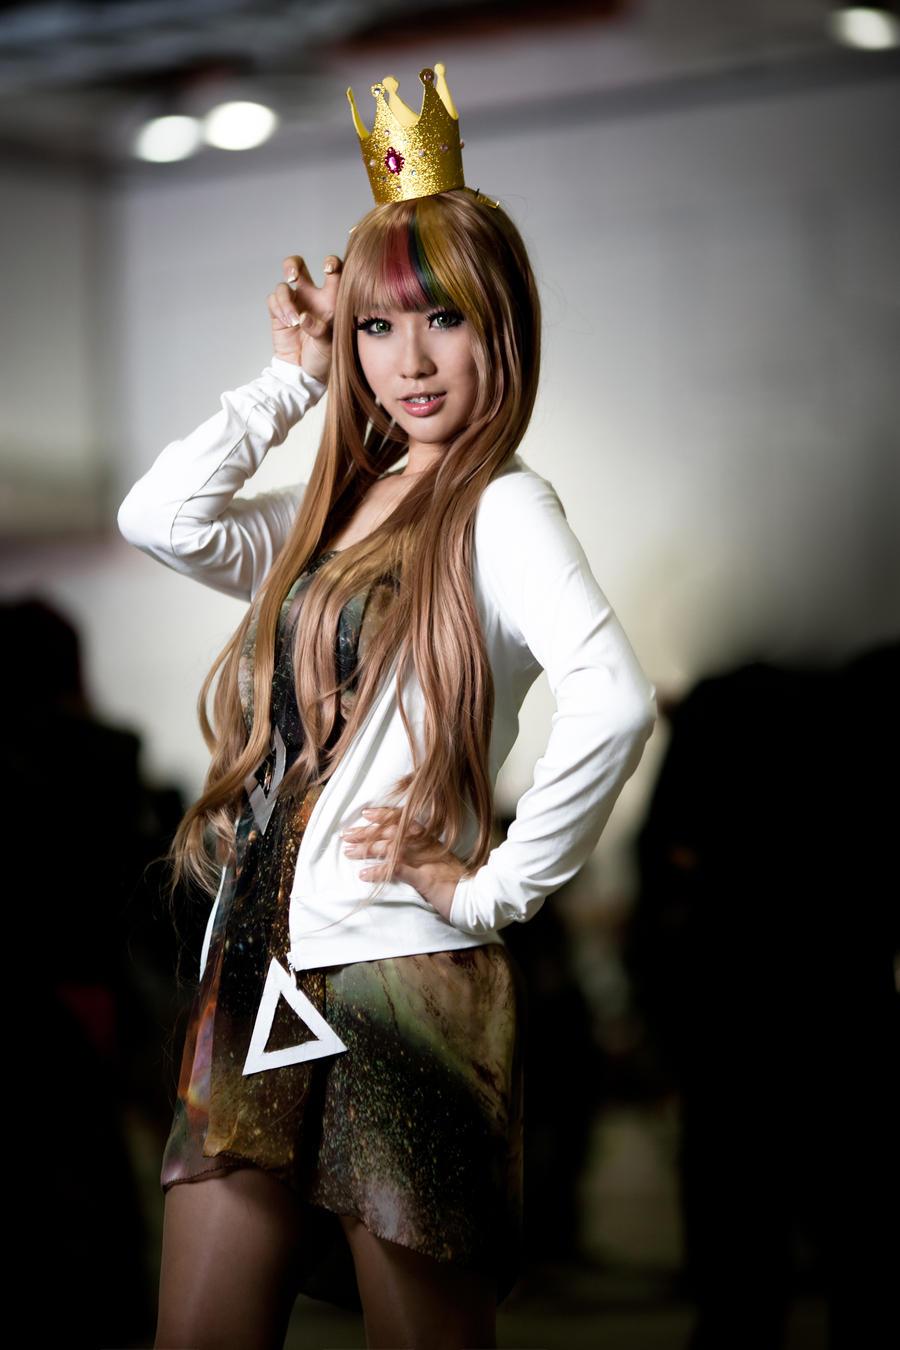 STGCC 2012: Vocaloid - Galaco by emi-liaricx